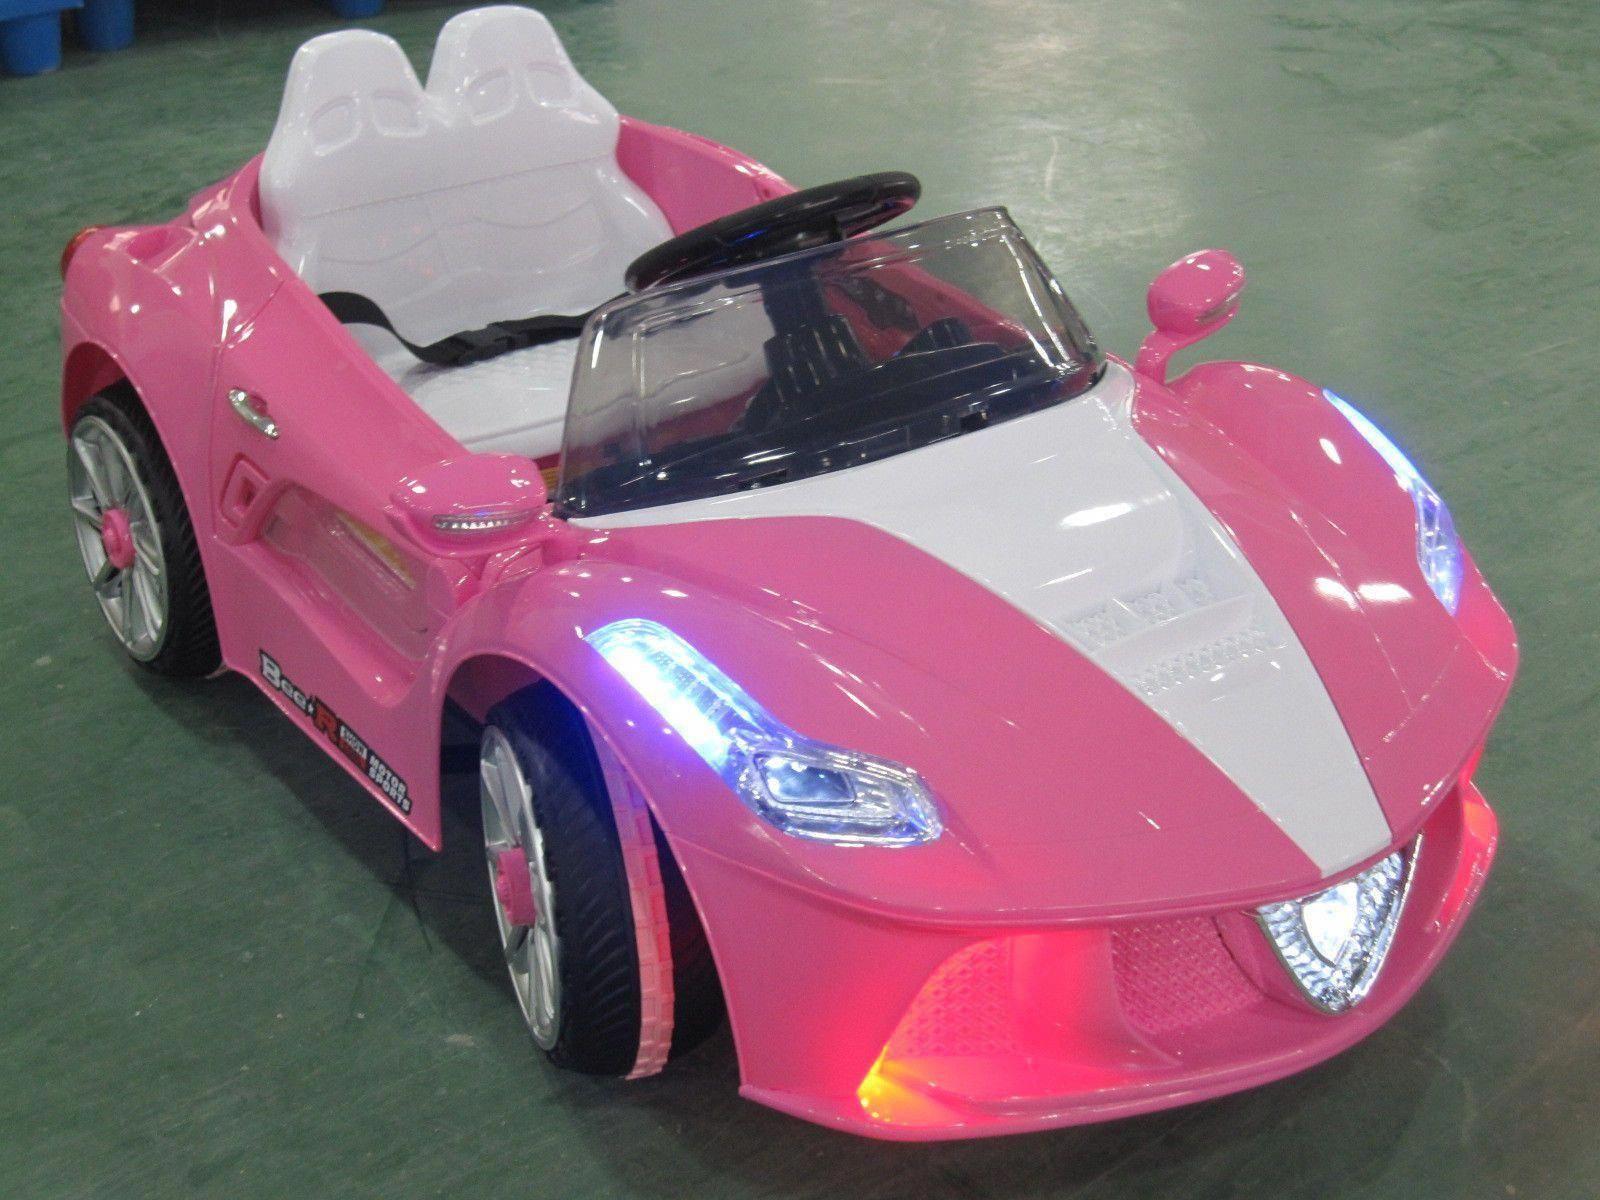 Ferrari spider style kids rideon car mp3 12v battery